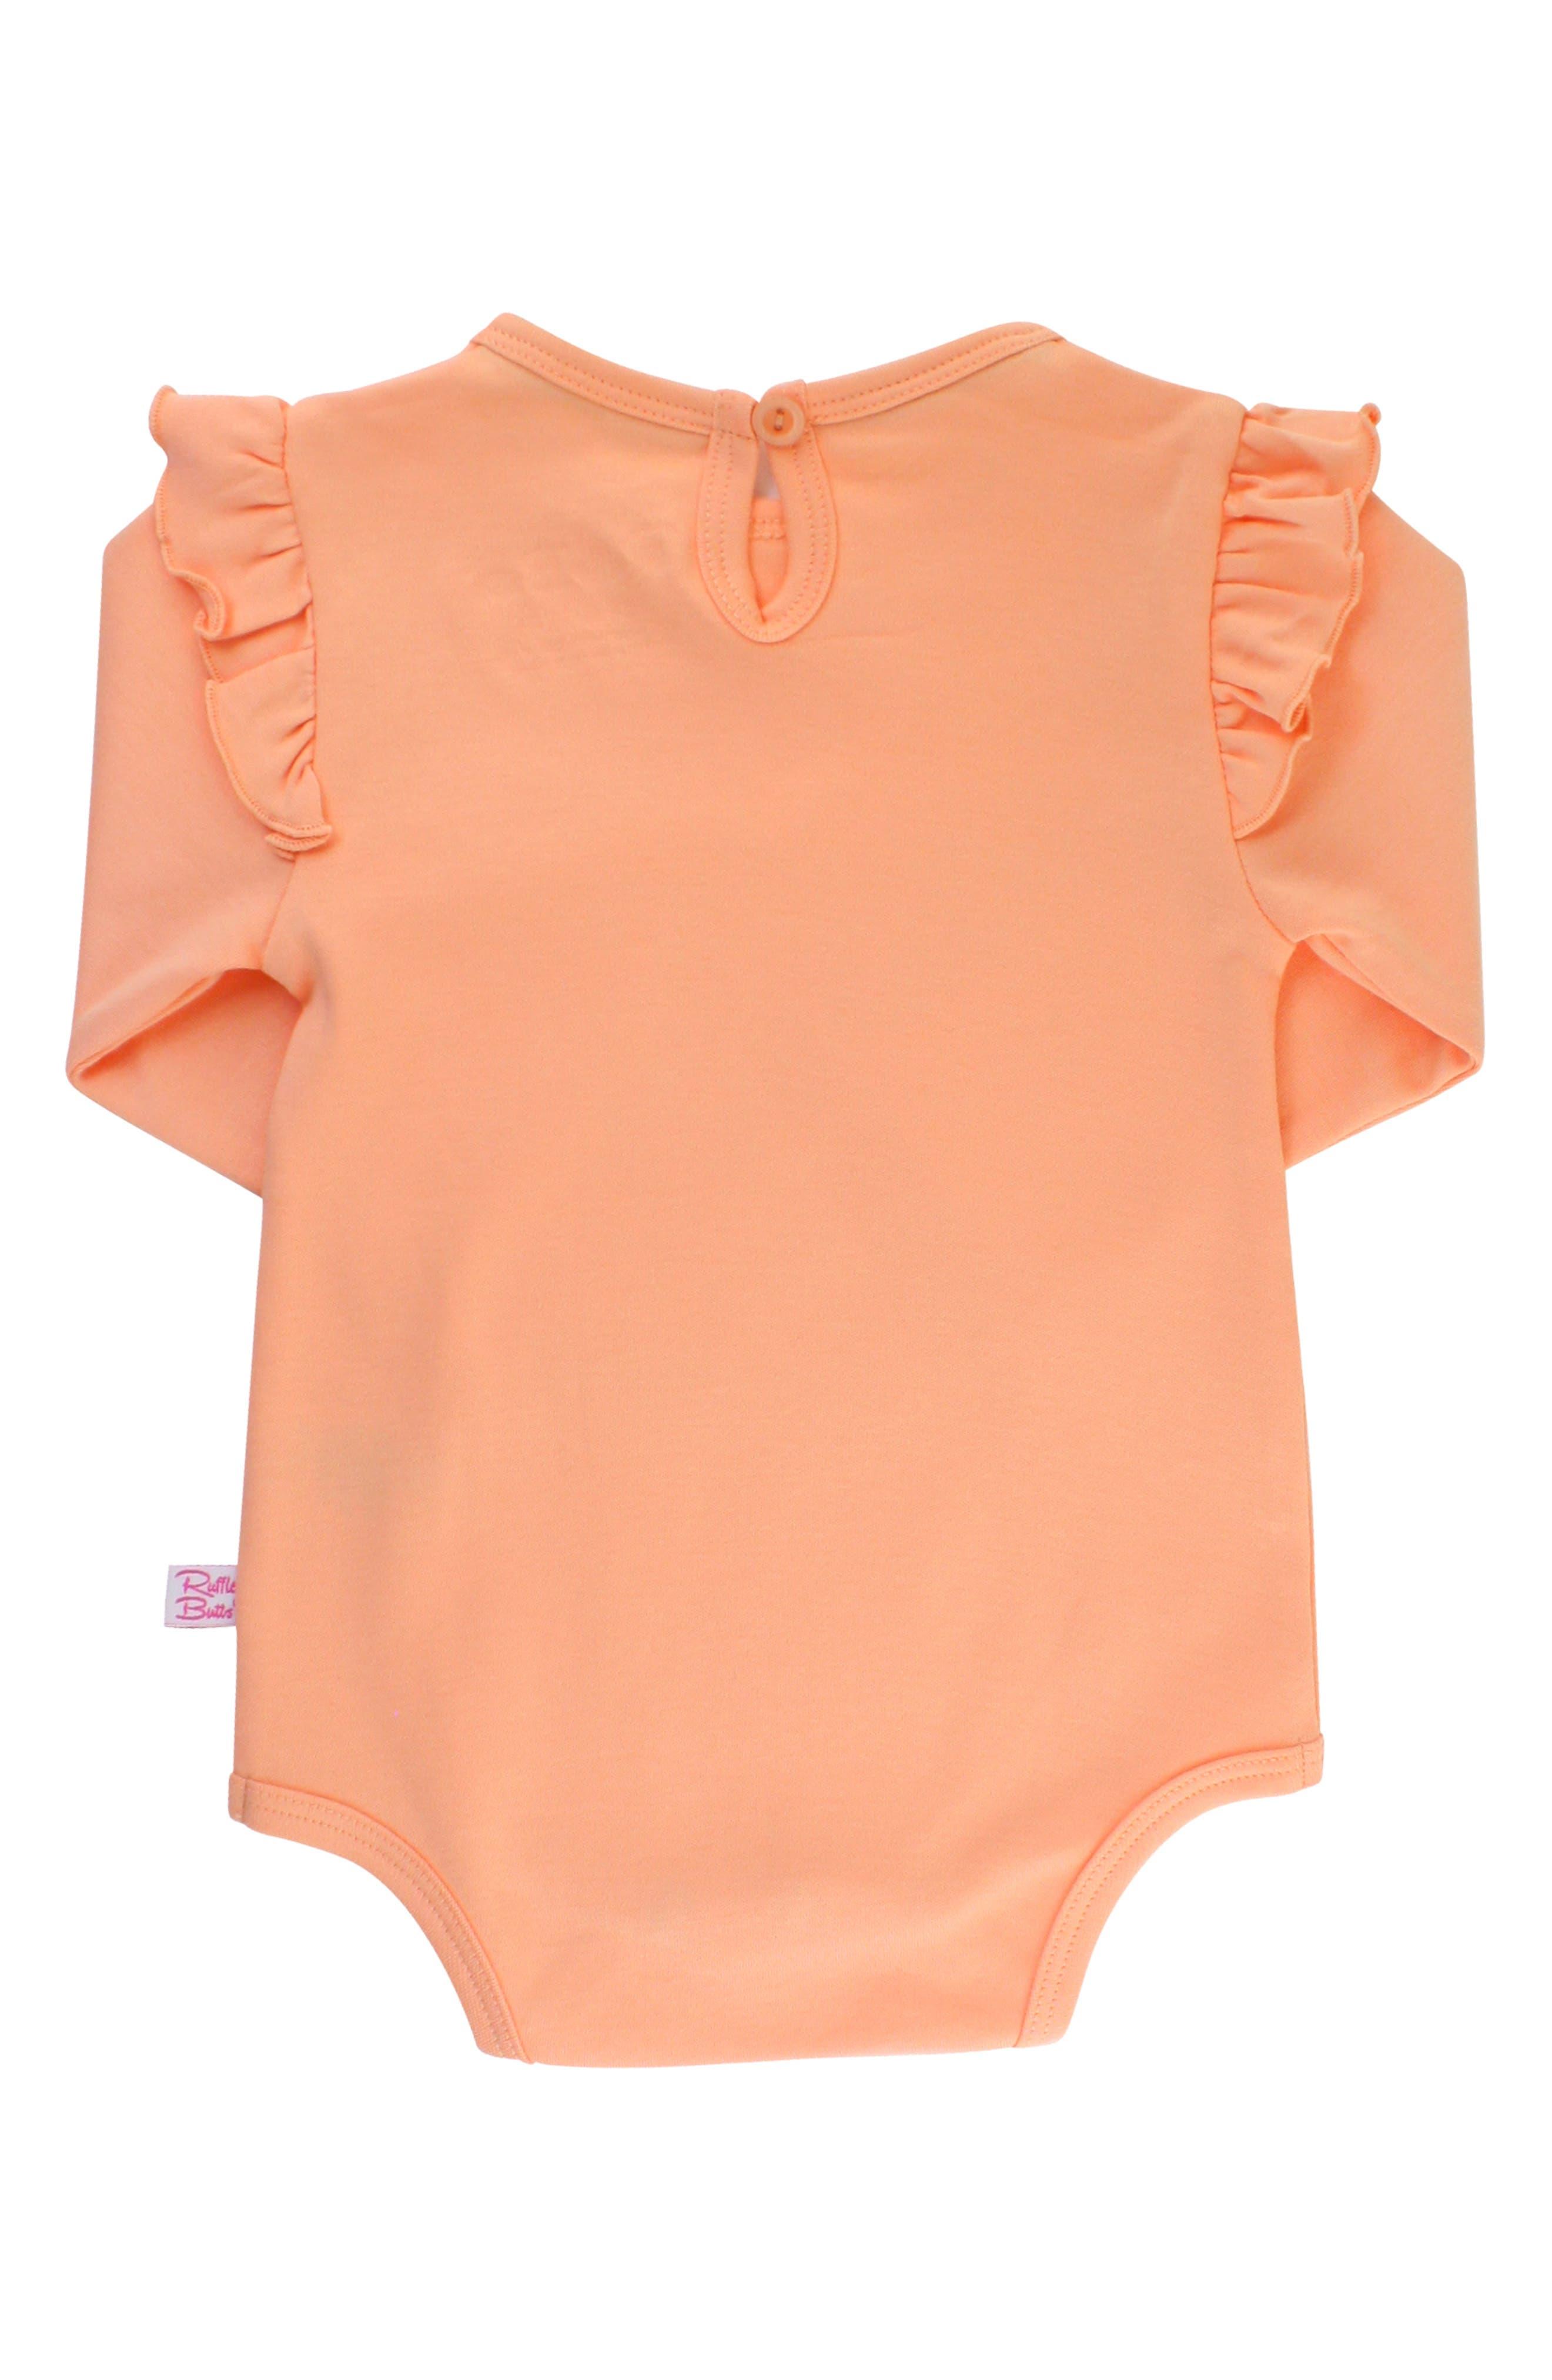 Apricot Bodysuit & Skirted Bloomers Set,                             Alternate thumbnail 5, color,                             DENIM